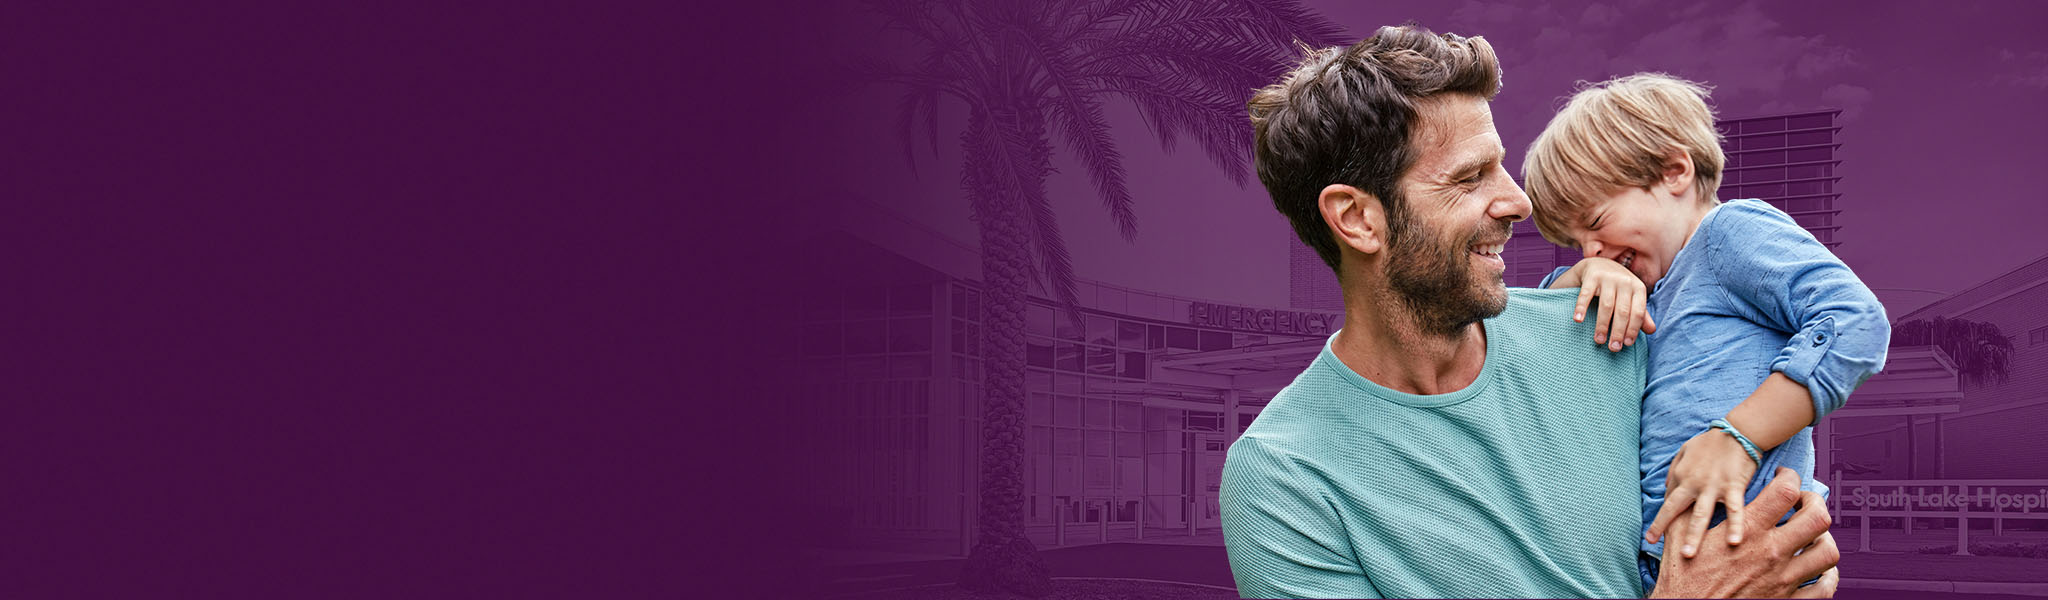 Orlando Health South Lake Hospital ER